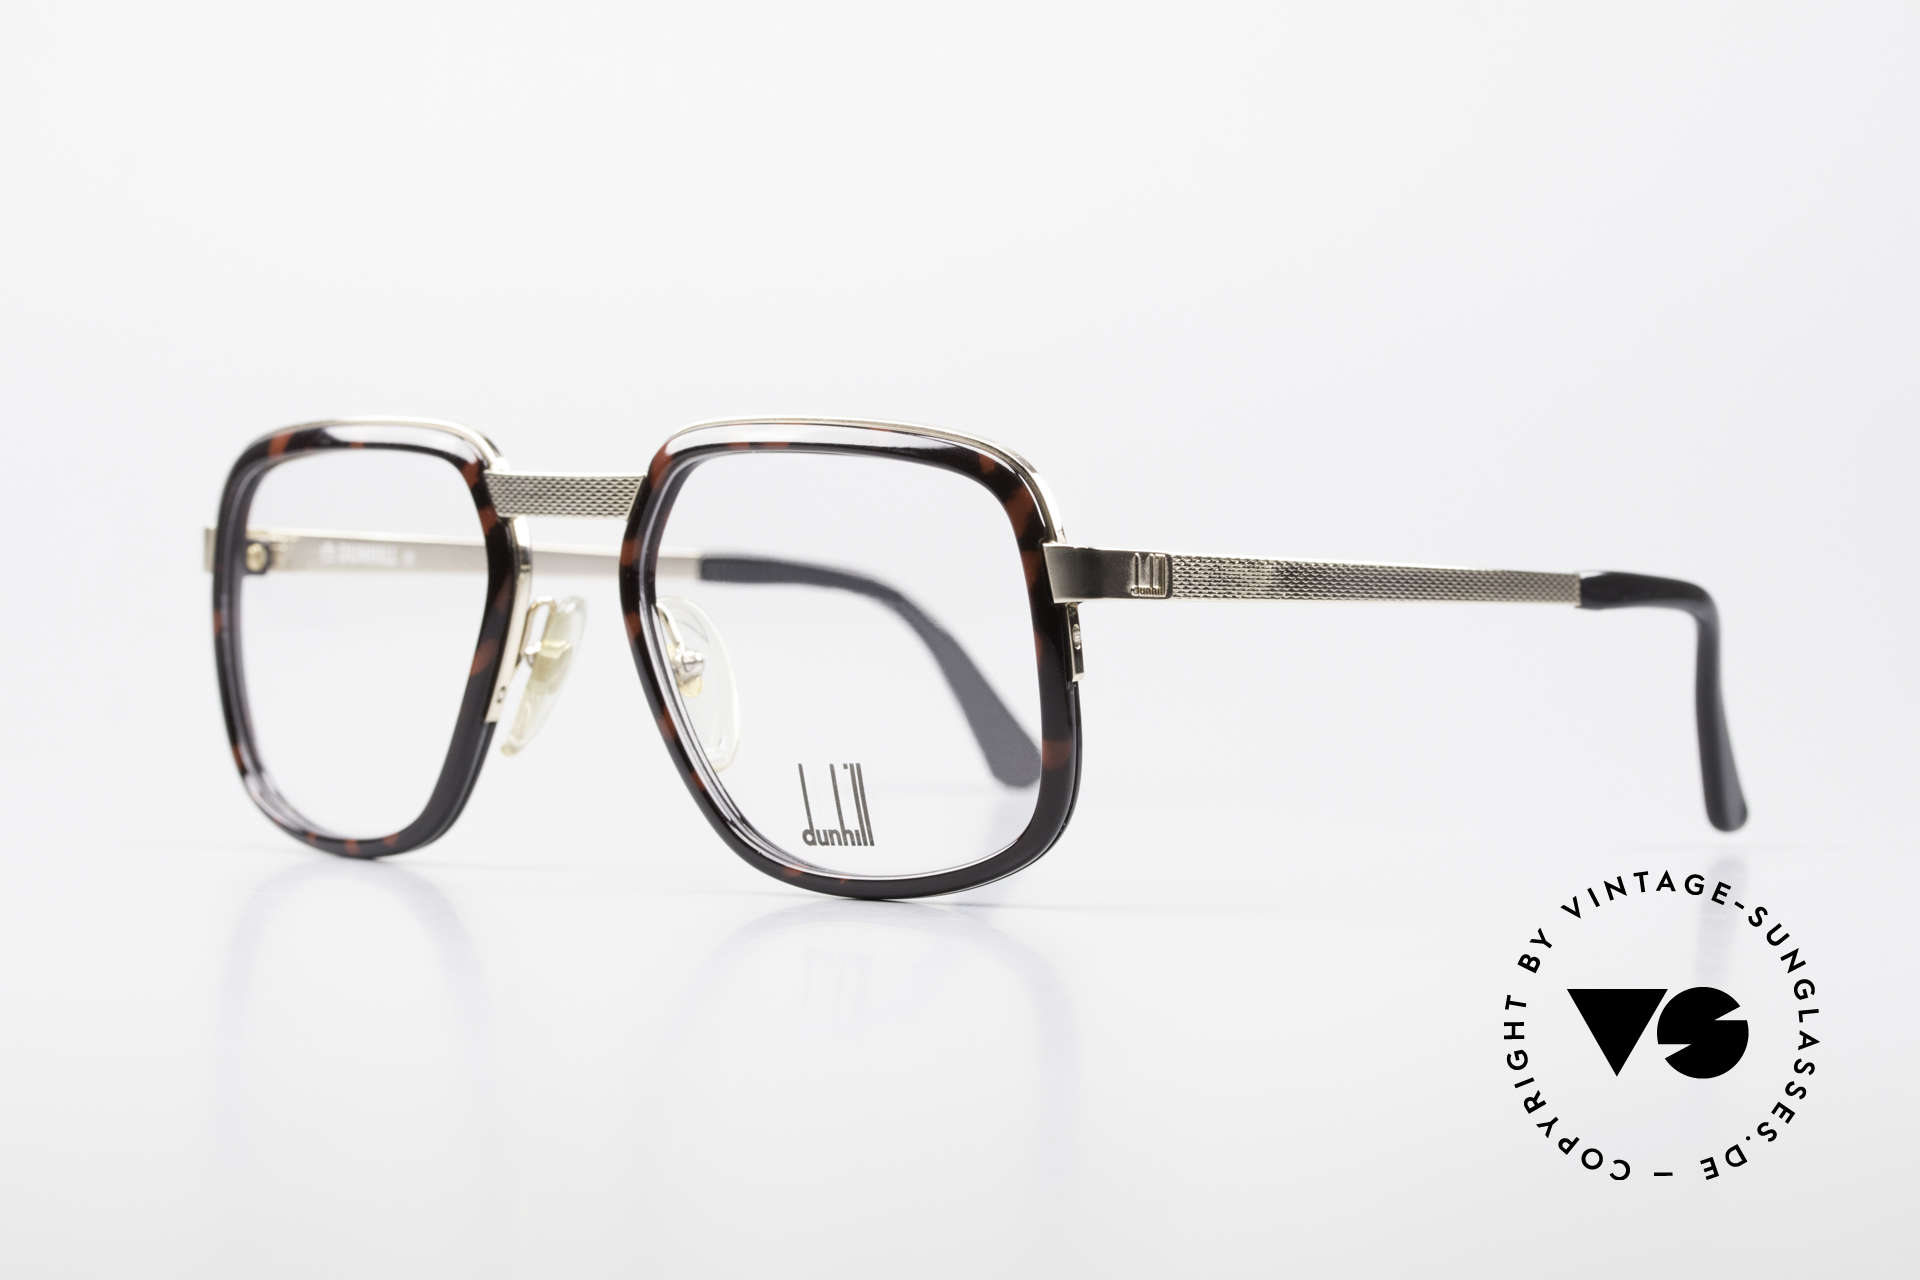 Dunhill 6073 Gold Plated 80's Men's Glasses, brilliant monolithic craftsmanship; gold-plated frame, Made for Men